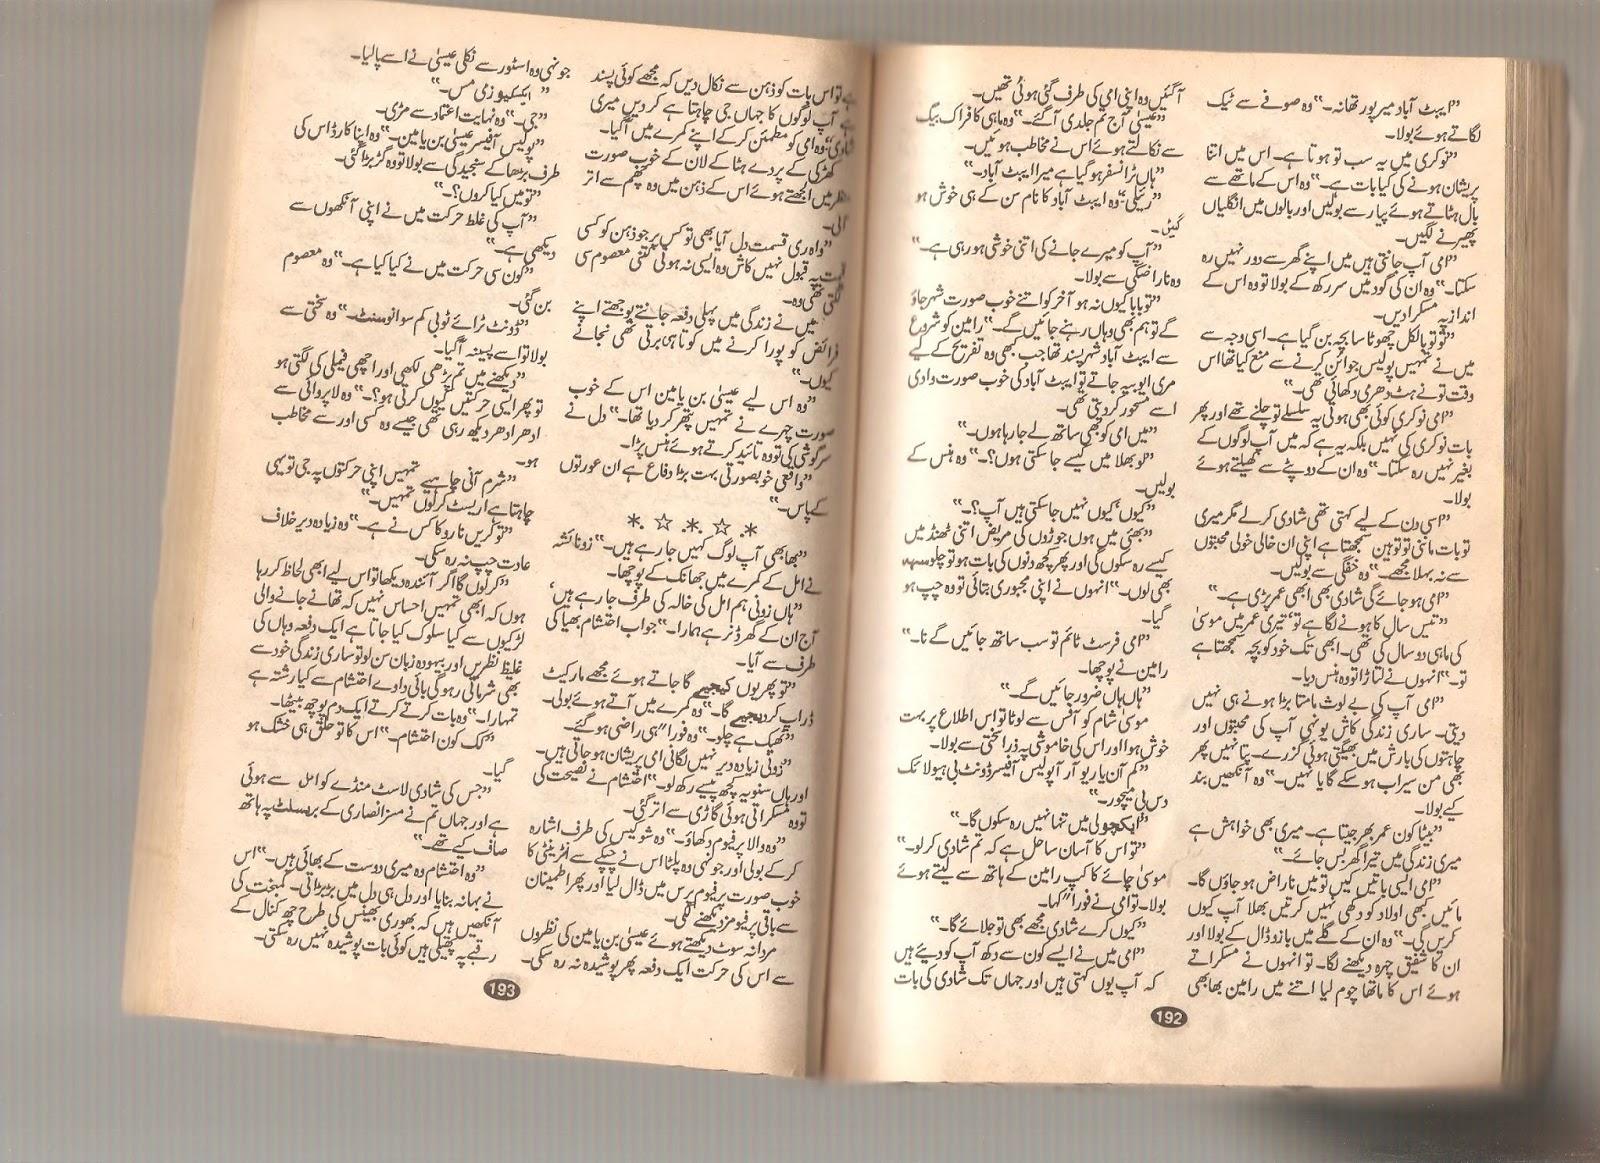 Yeh Nao Poram Paar Lagi By Lubna Jadoon Forced Marriage Novel